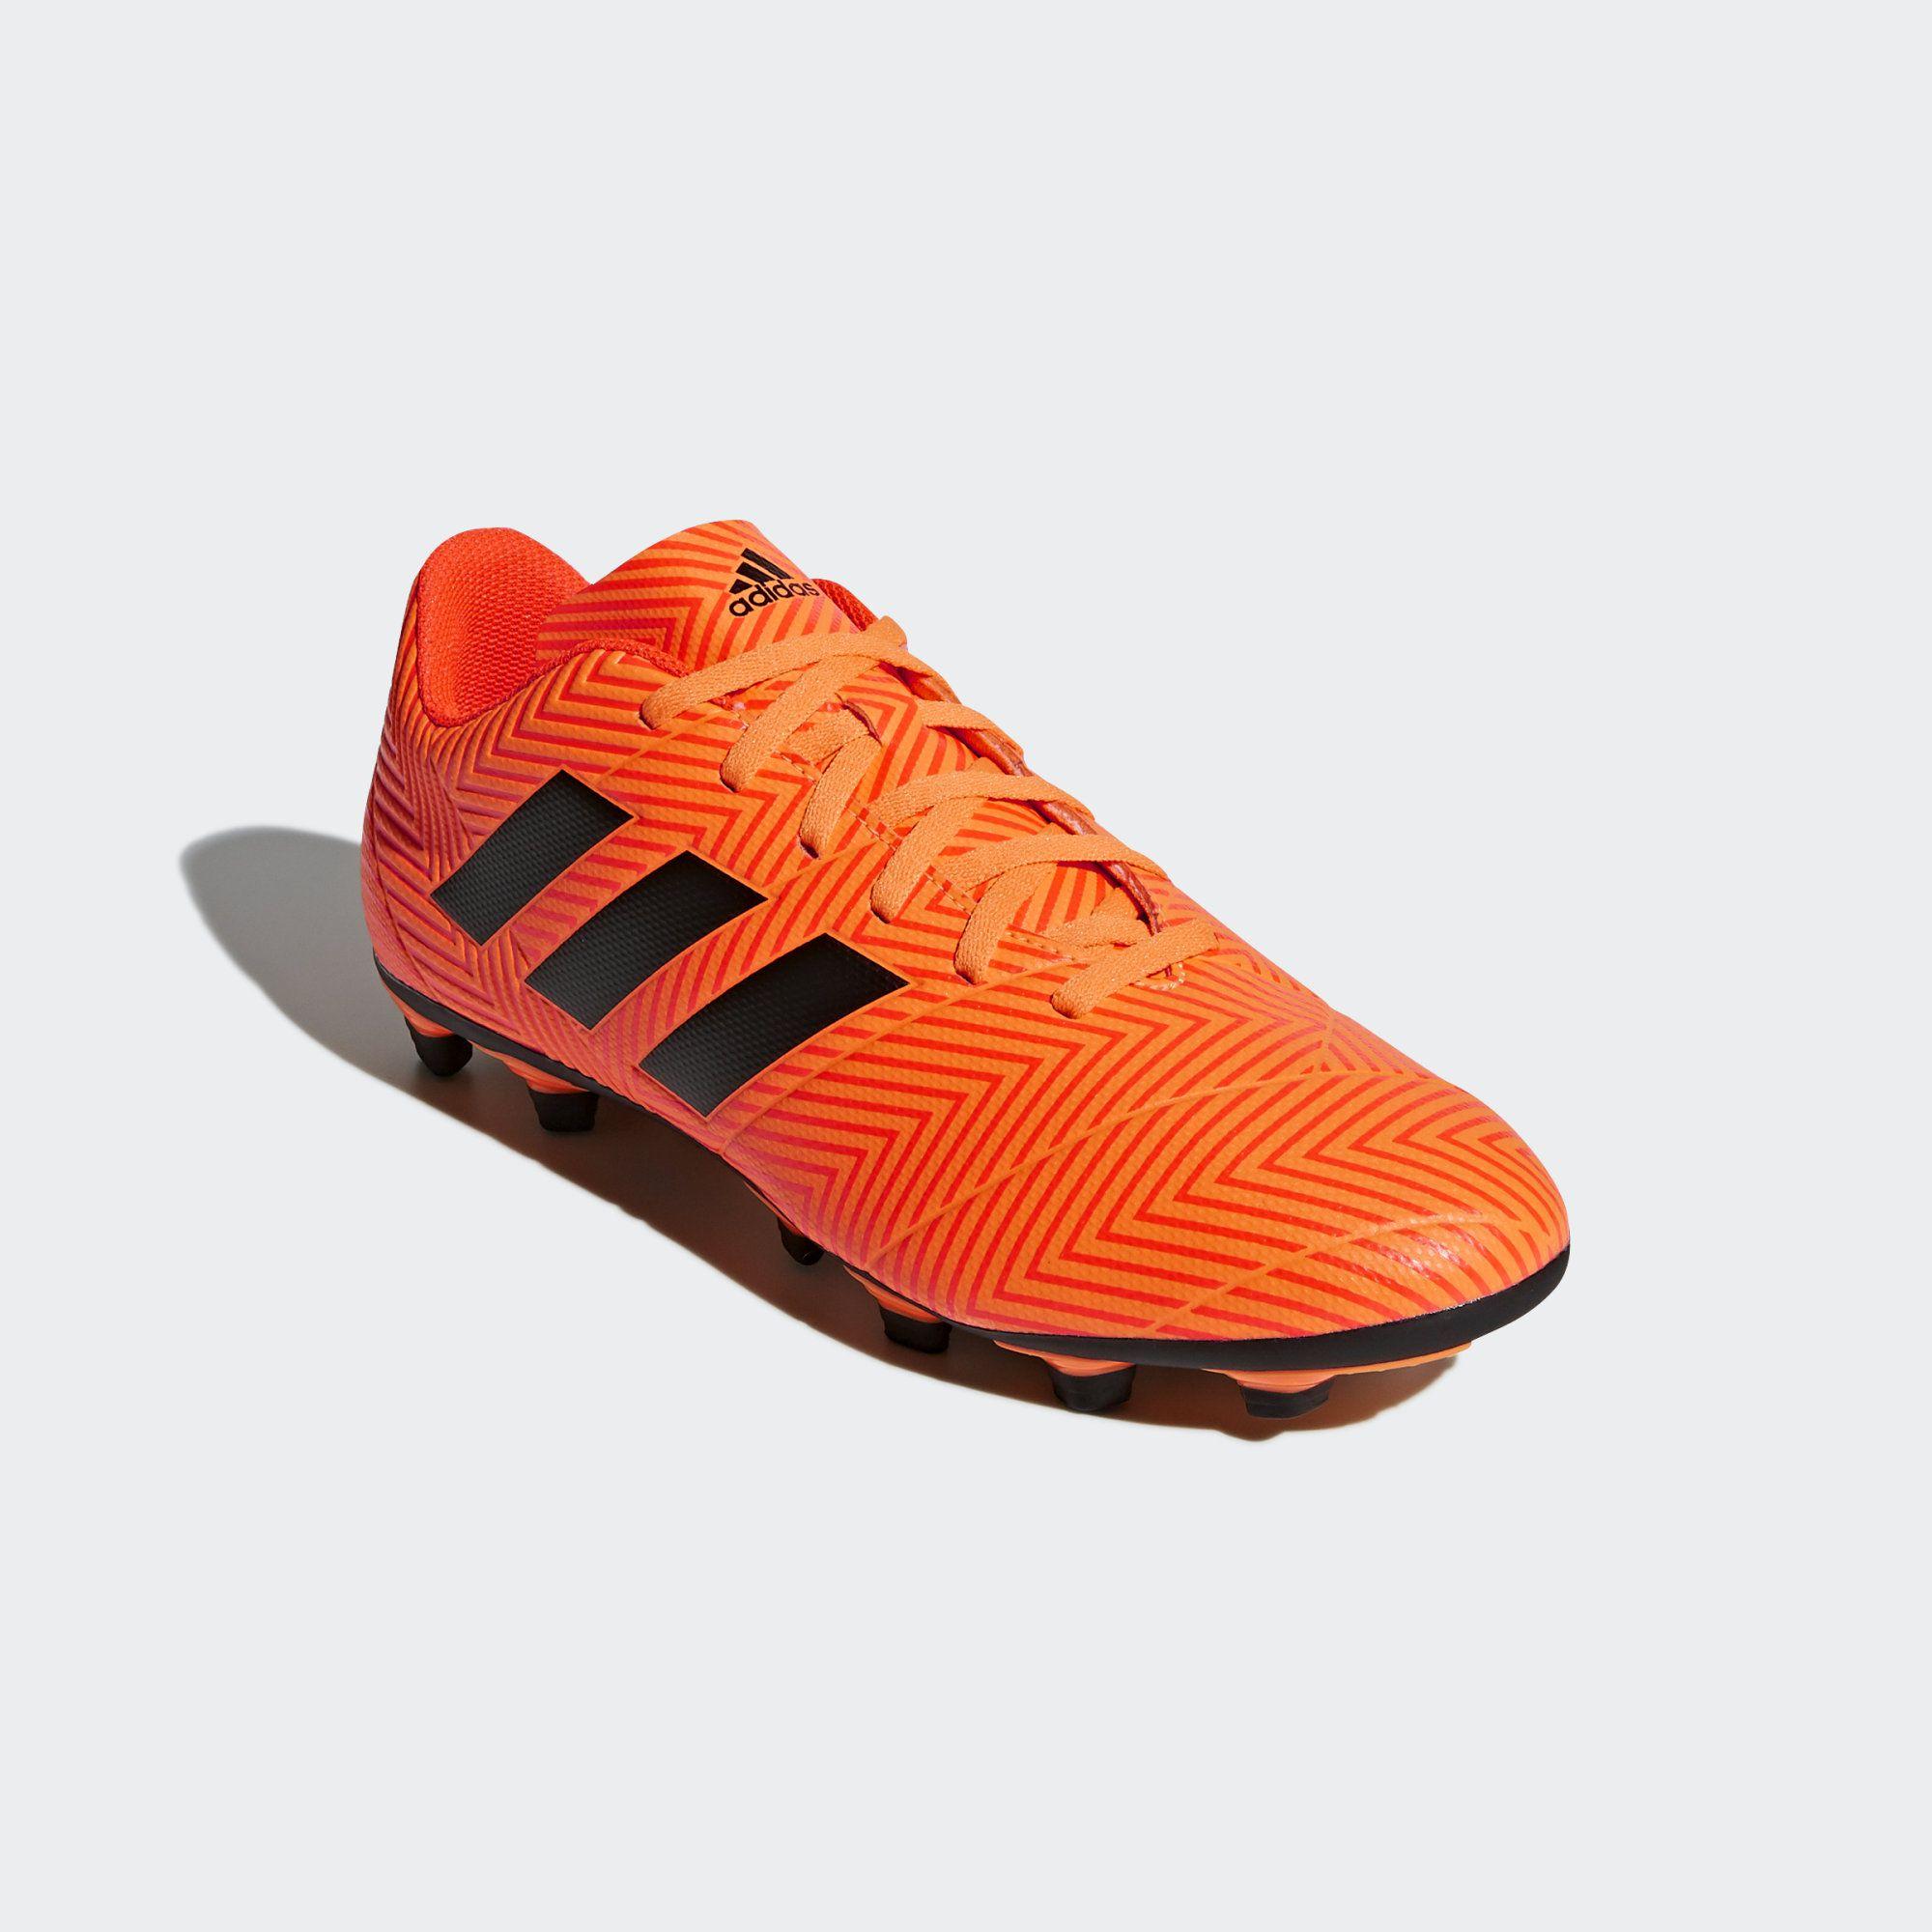 Chuteira Adidas Nemeziz 18.4 FxG Campo